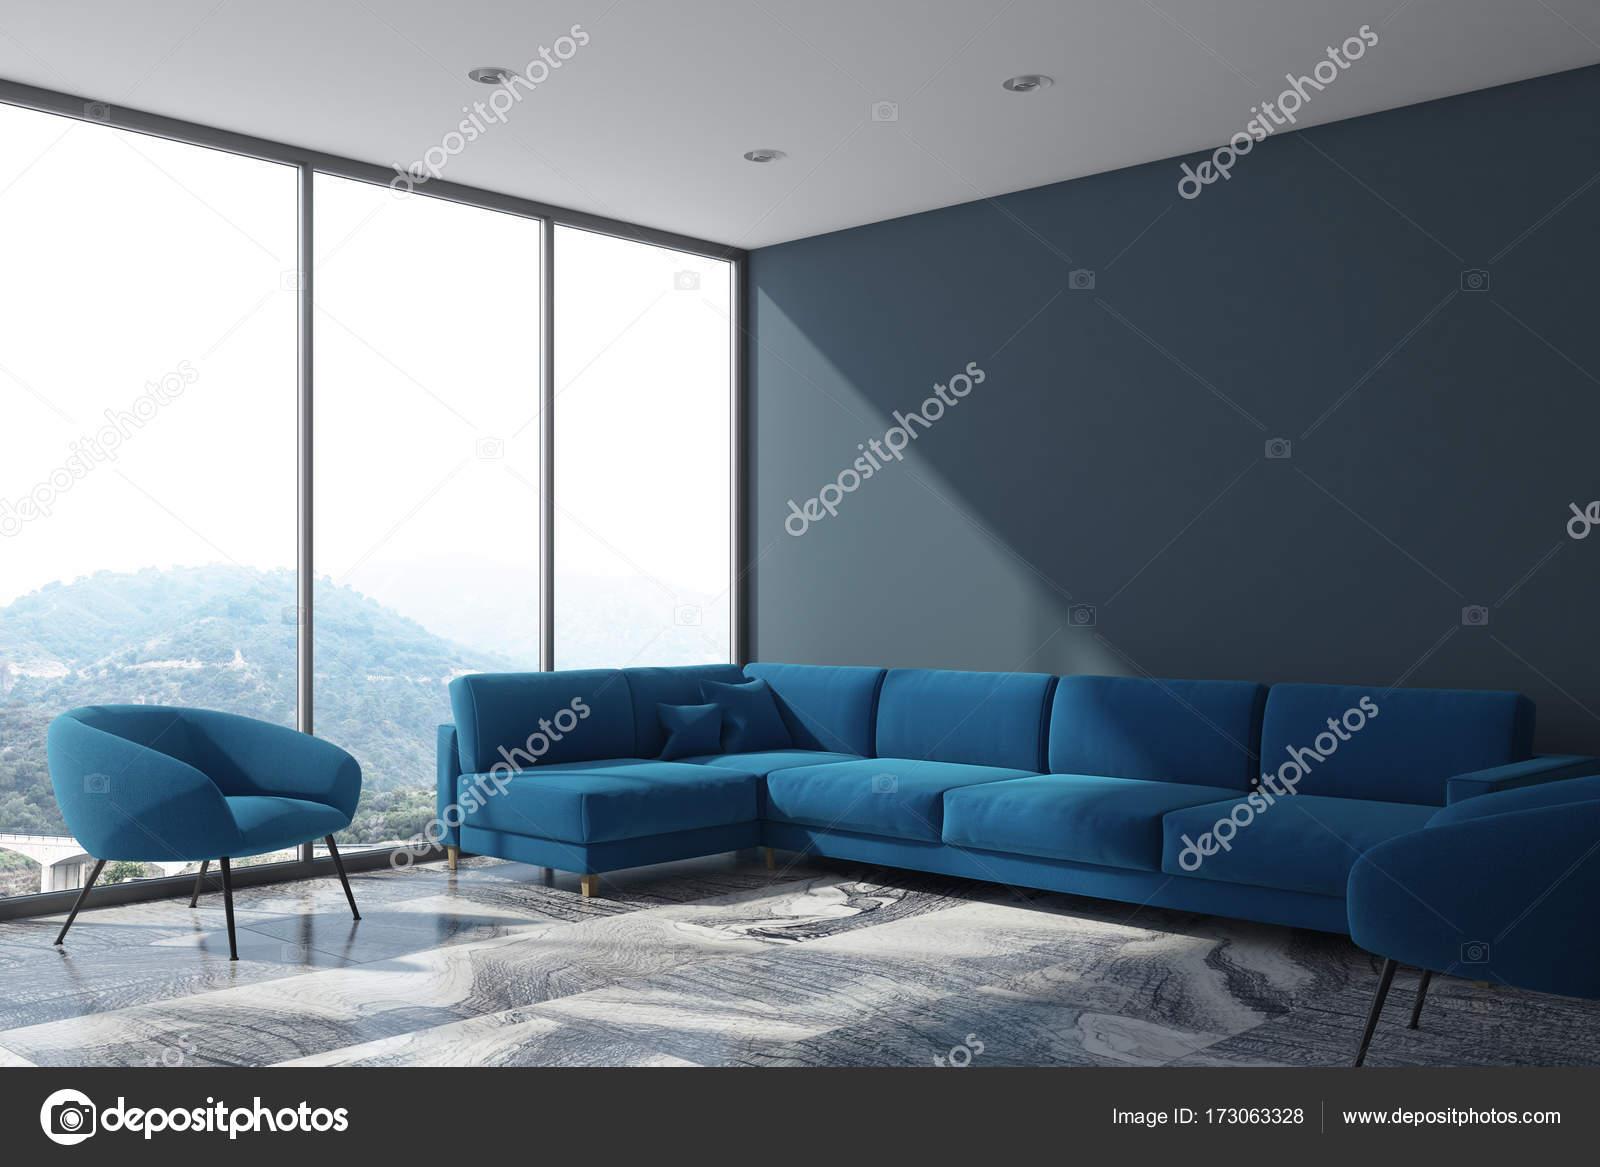 Blau Grau Wohnzimmer Sofa Loft Seite Stockfoto C Denisismagilov